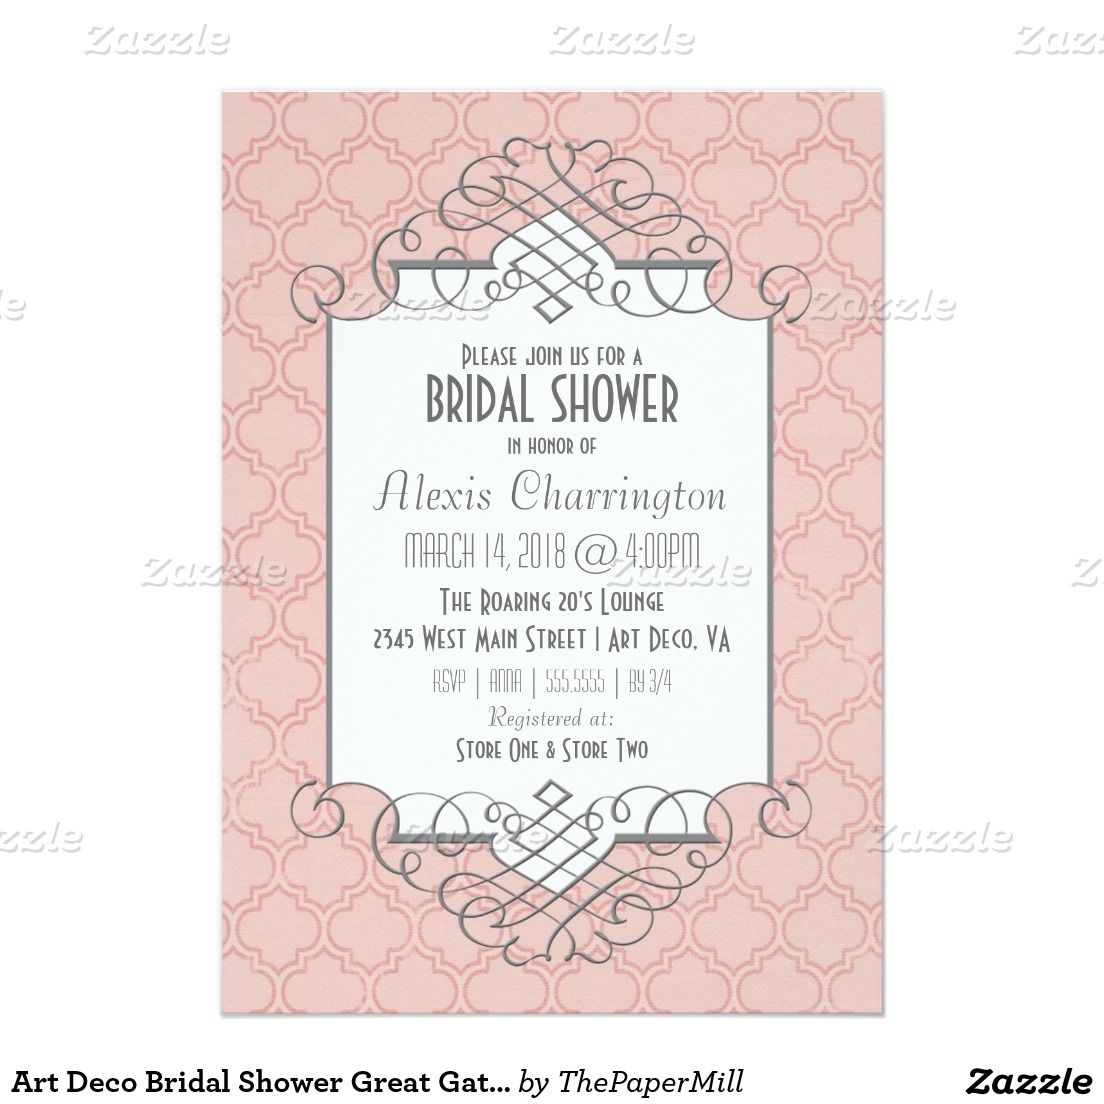 Art Deco Bridal Shower Great Gatsby Style 5x7 Paper Invitation Card